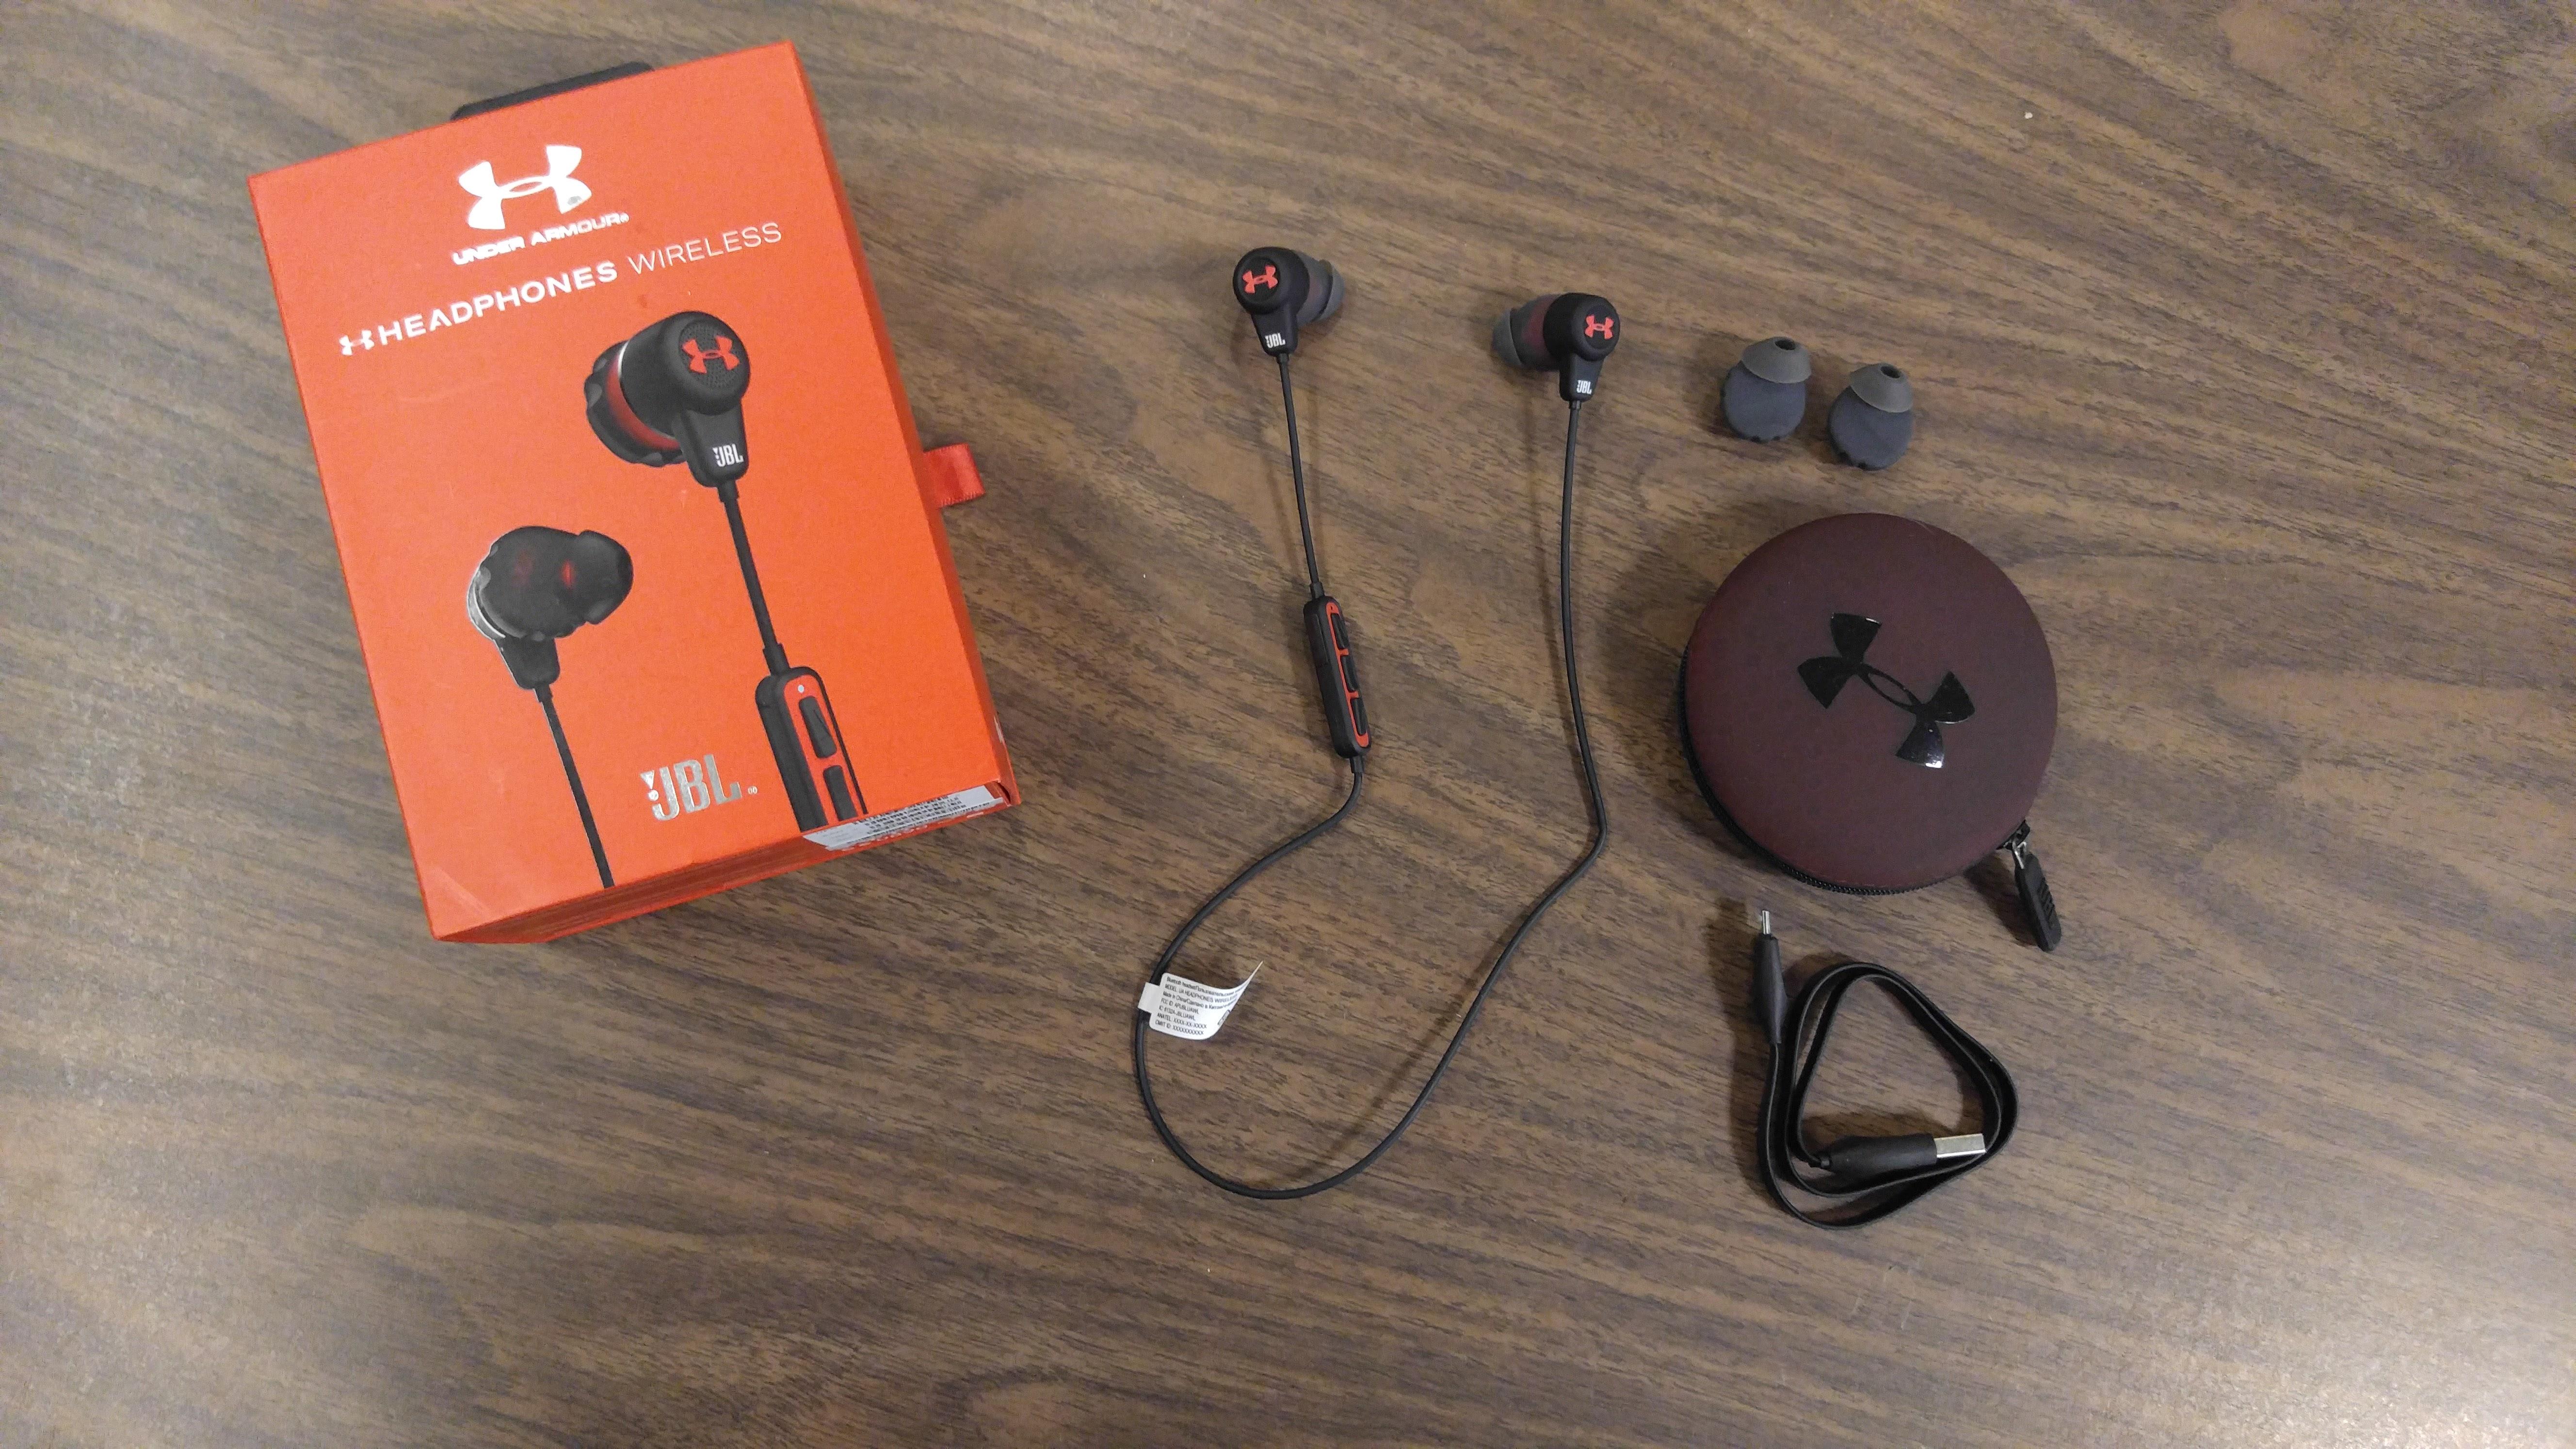 UA Wireless Headphones JBL Under Armour headphones Review - What's In the Box - Analie Cruz